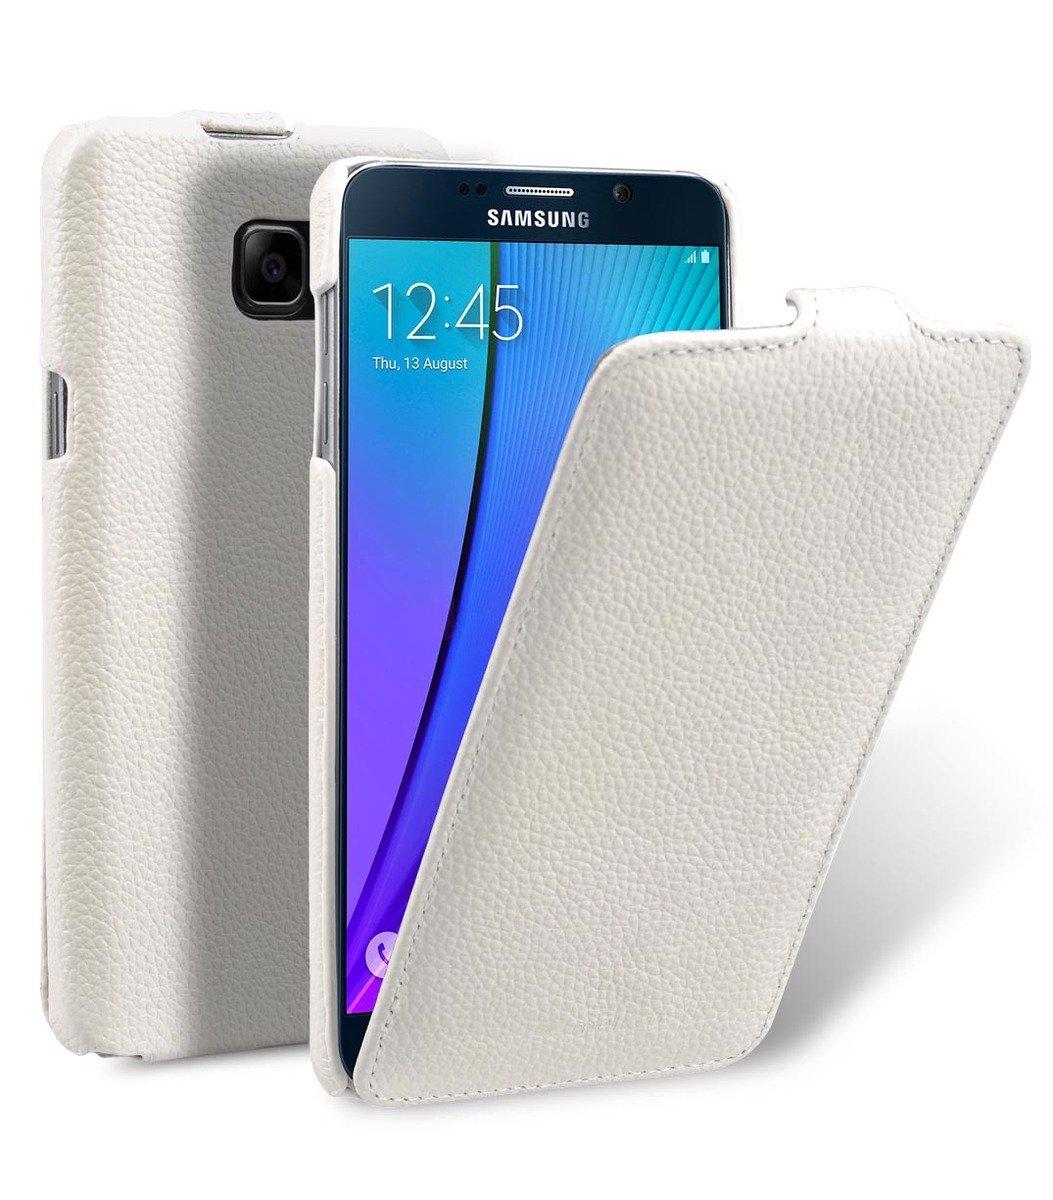 Samsung Galaxy Note 5 Jacka Type 高級真皮革手機套 - 白色荔枝紋